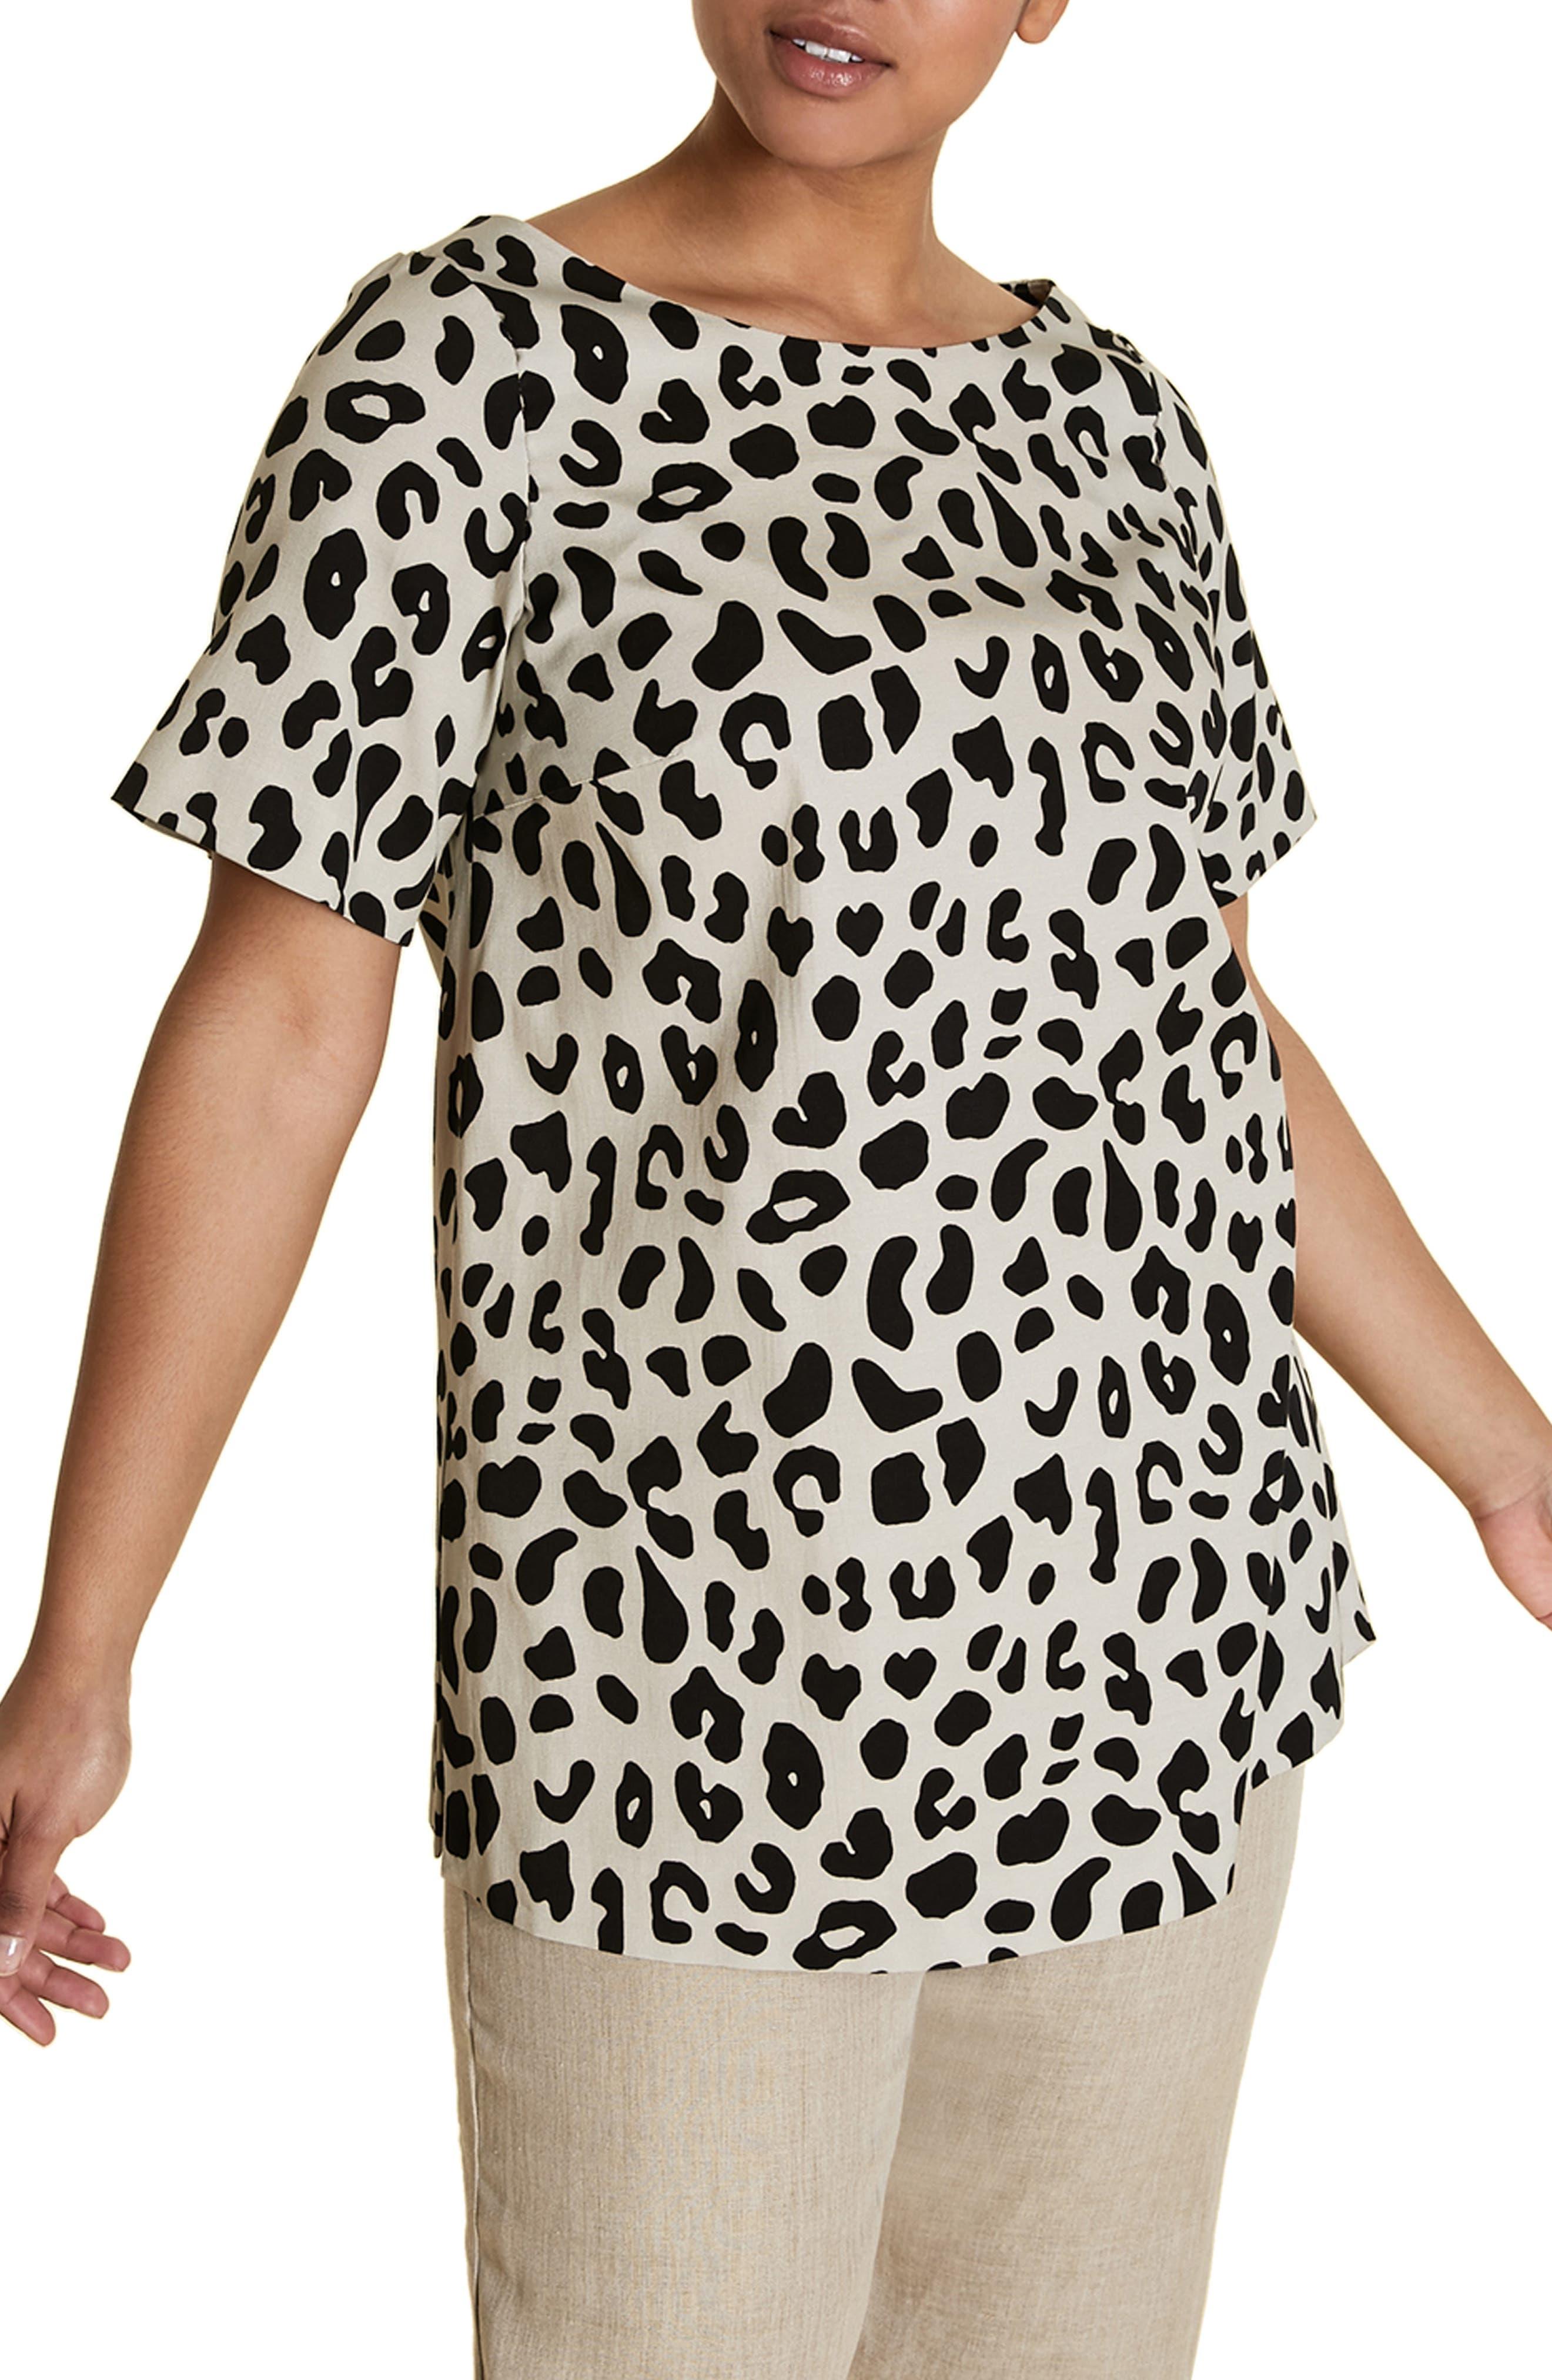 plus size women's marina rinaldi fregio tunic with attachable sleeves